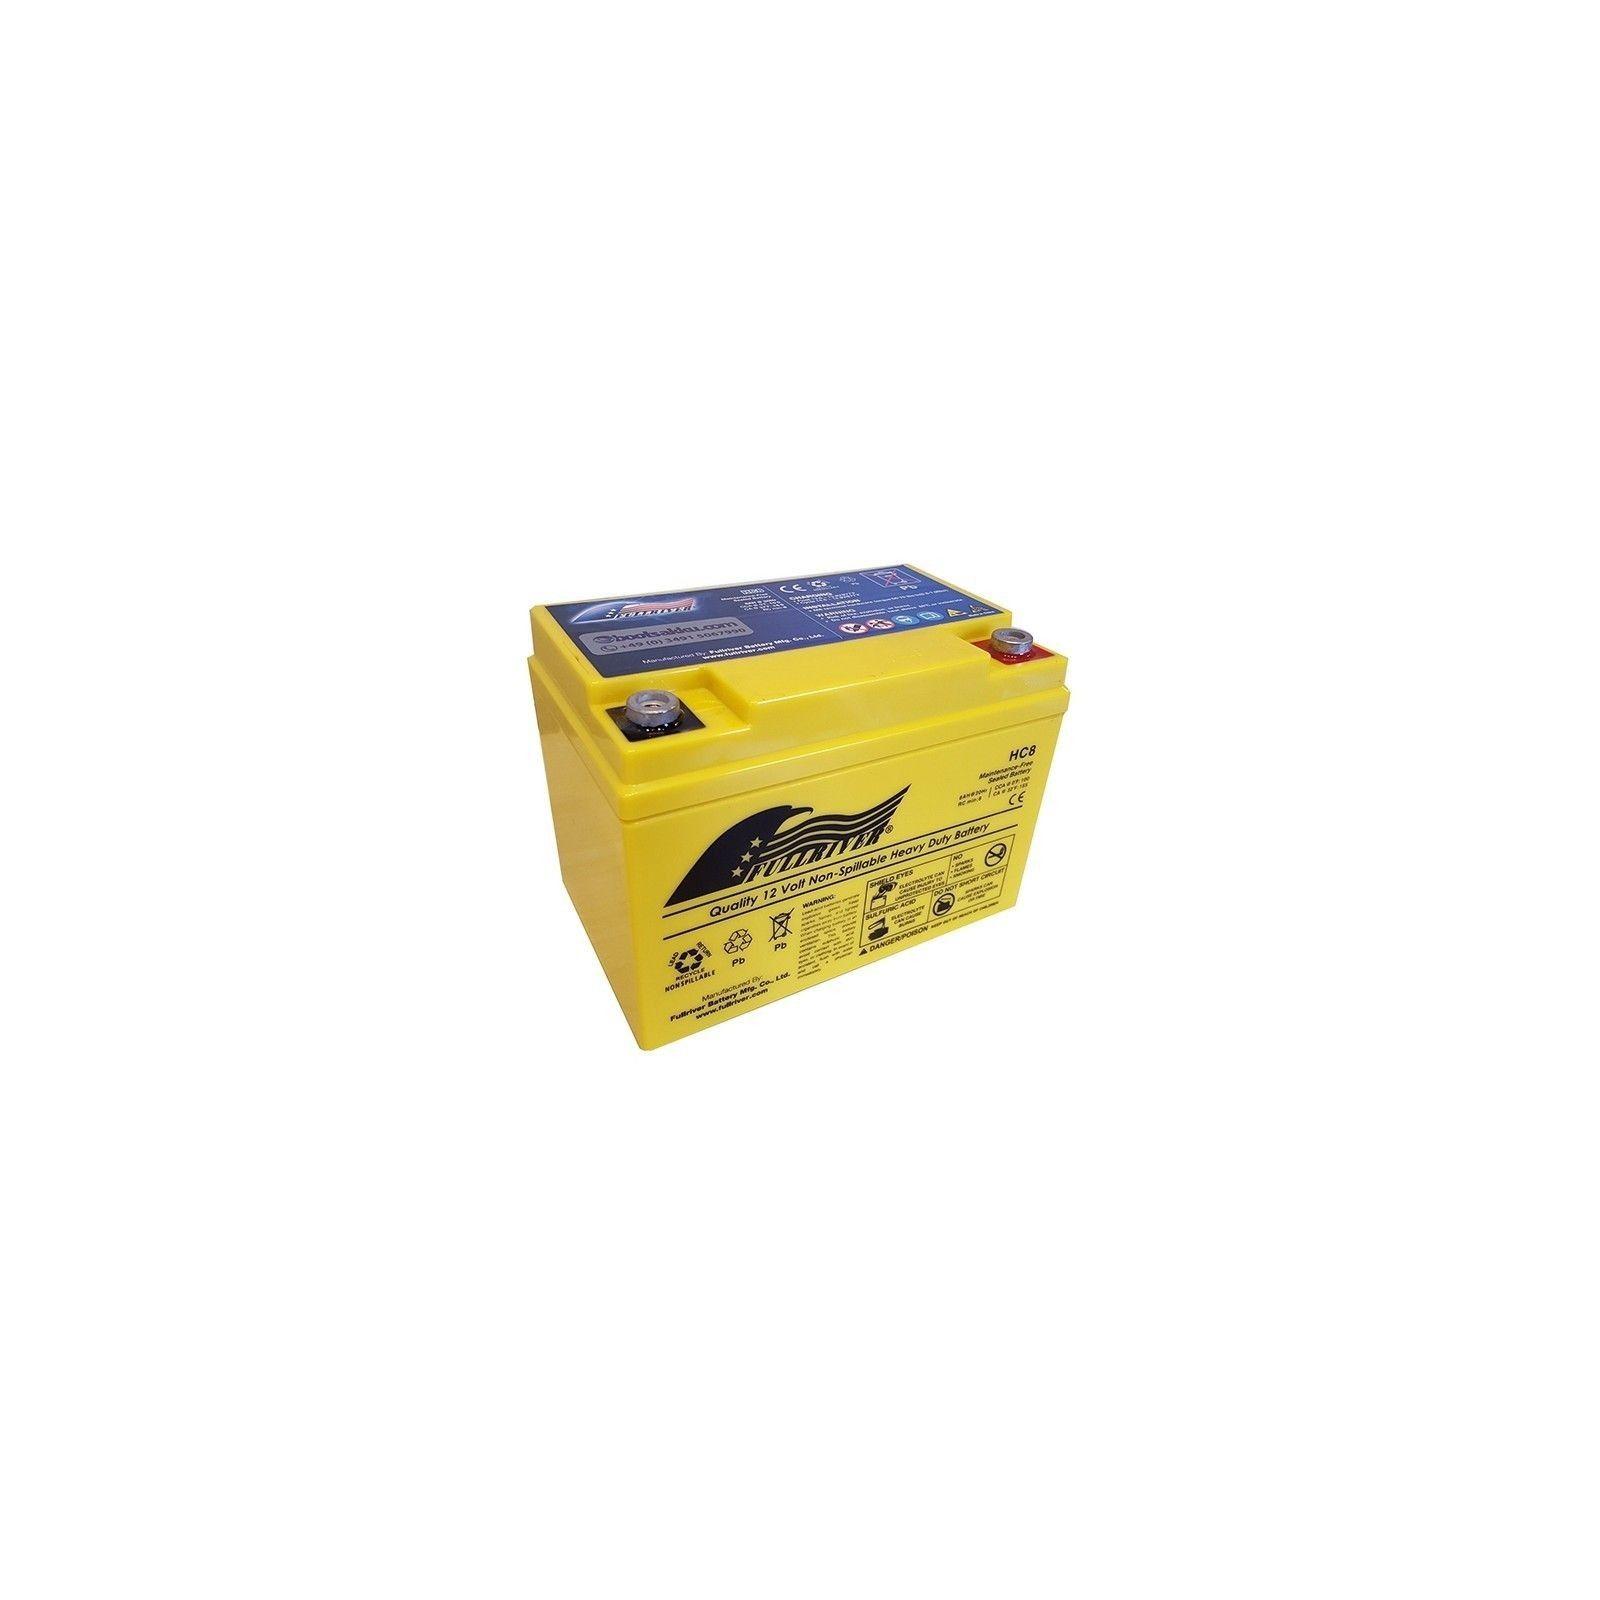 Battery Fullriver HC8 8Ah 100A 12V Hc FULLRIVER - 1